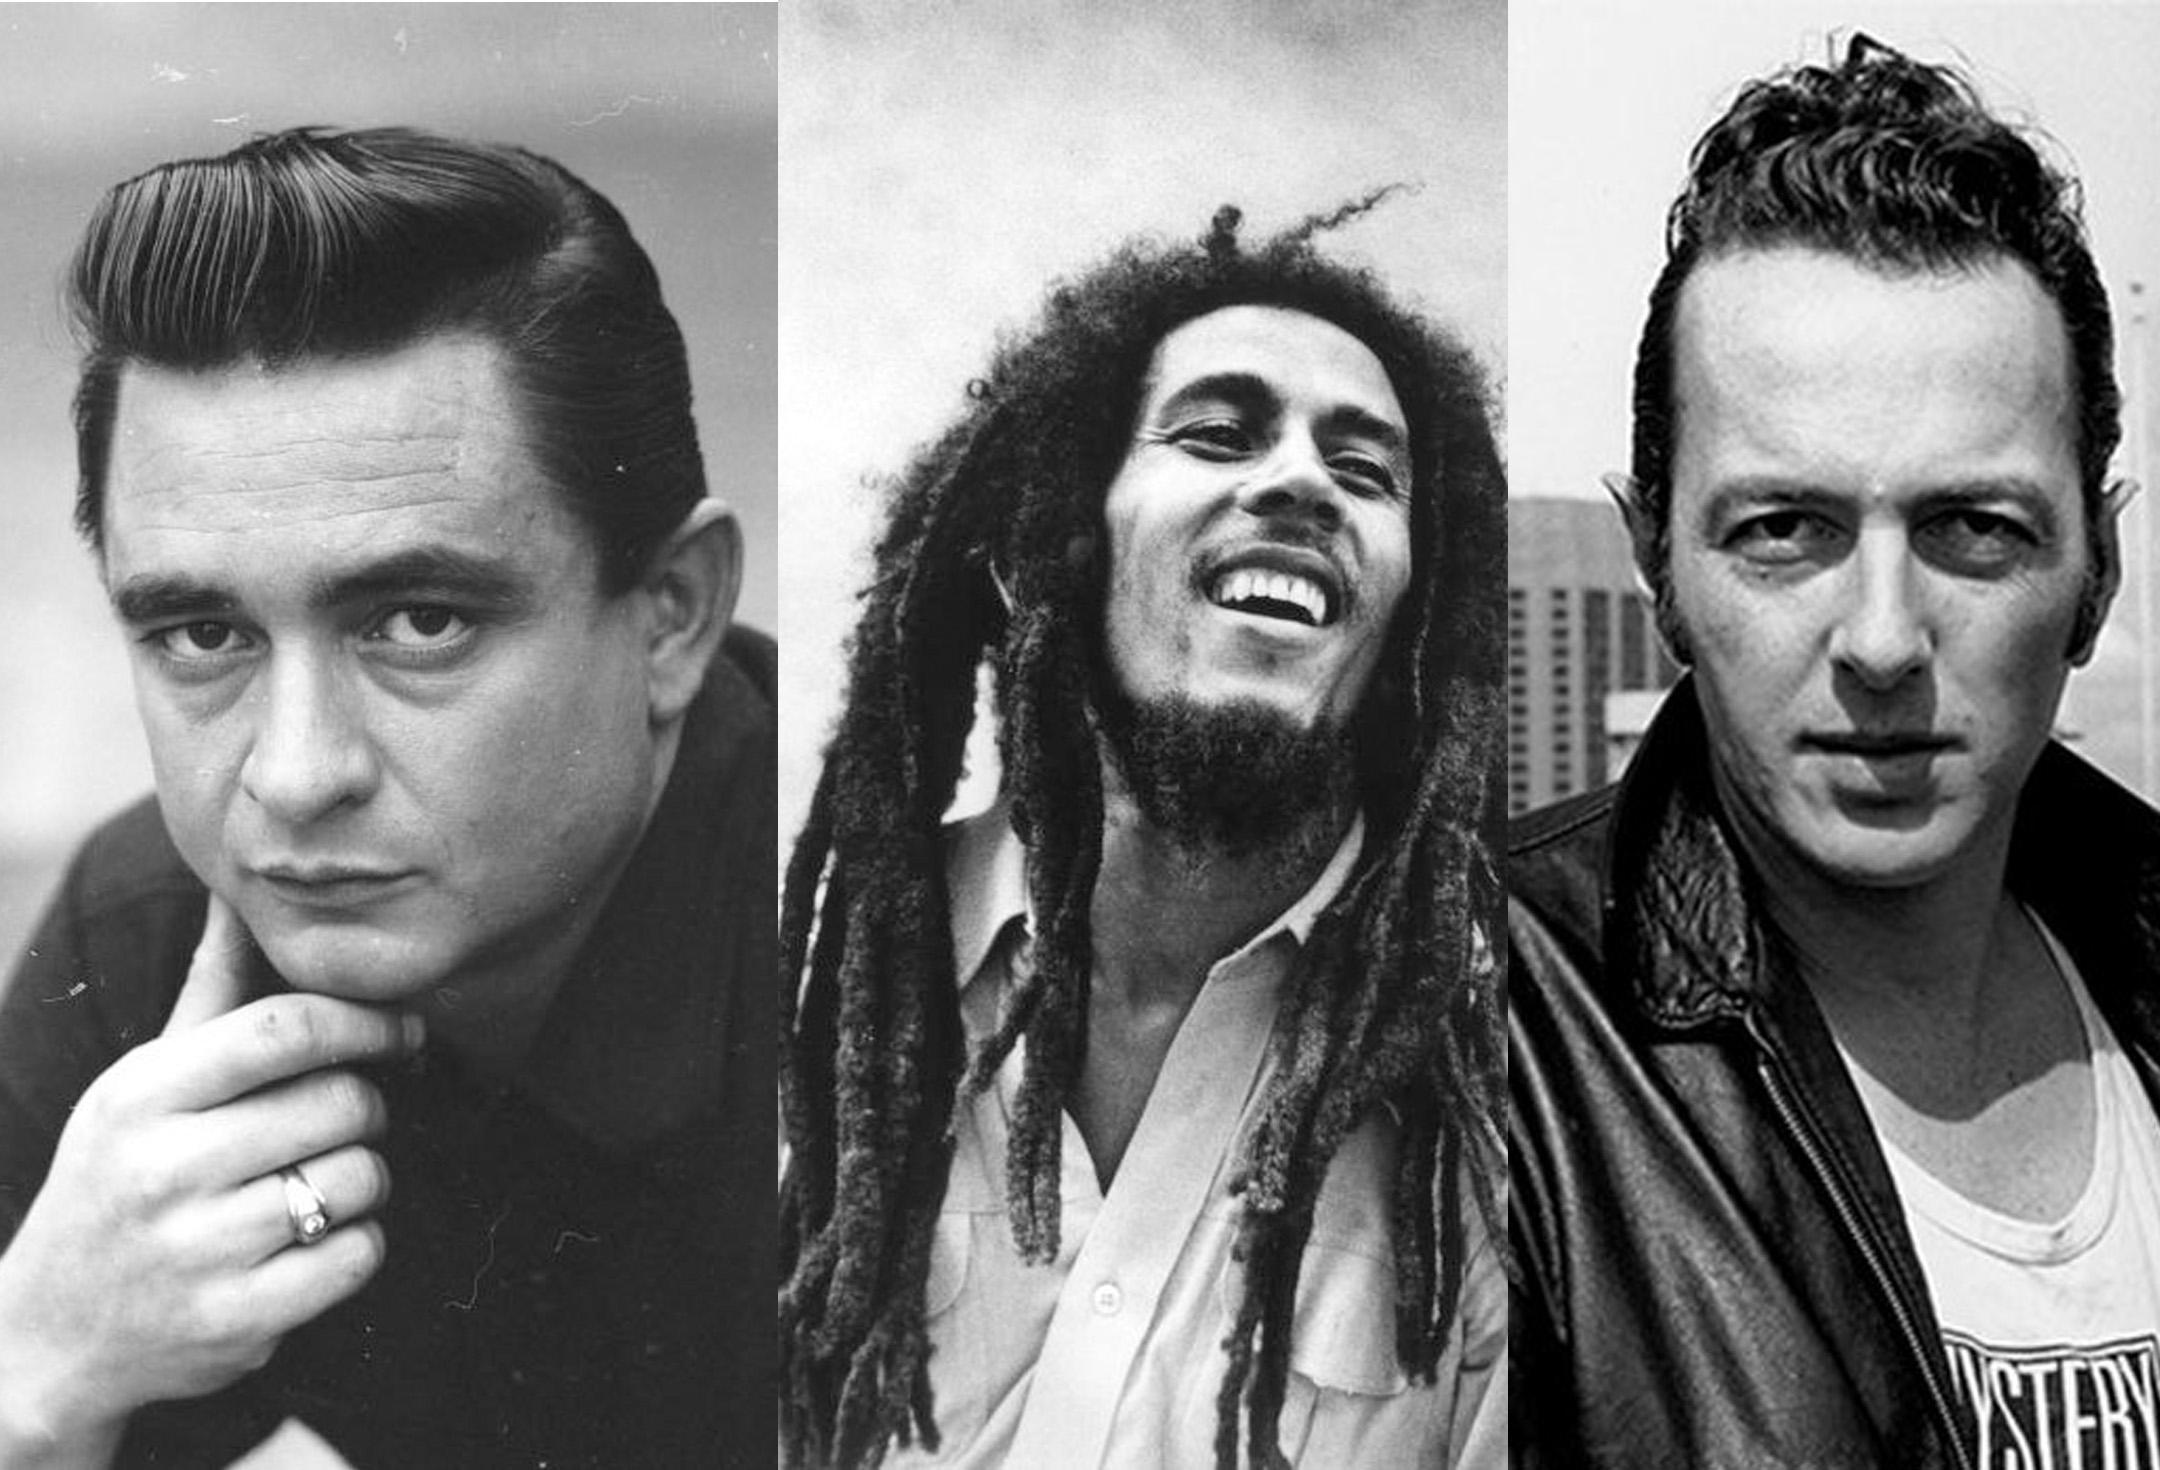 Redemption Song,Bob Marley, Johnny Cash, Joe Strummer